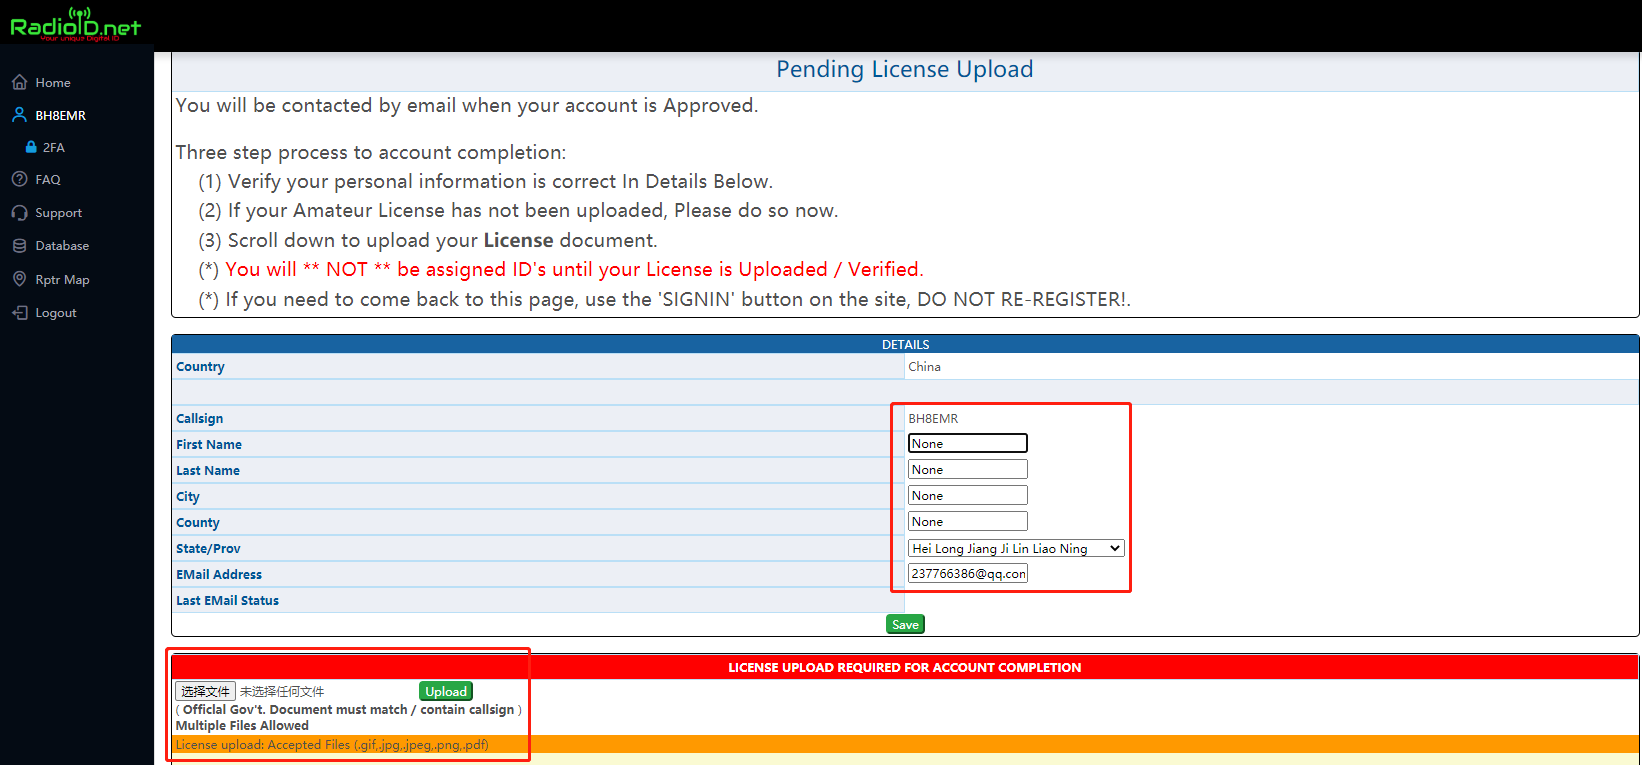 MMDVM注册DMRid和注册BrandMeister设置静态组呼